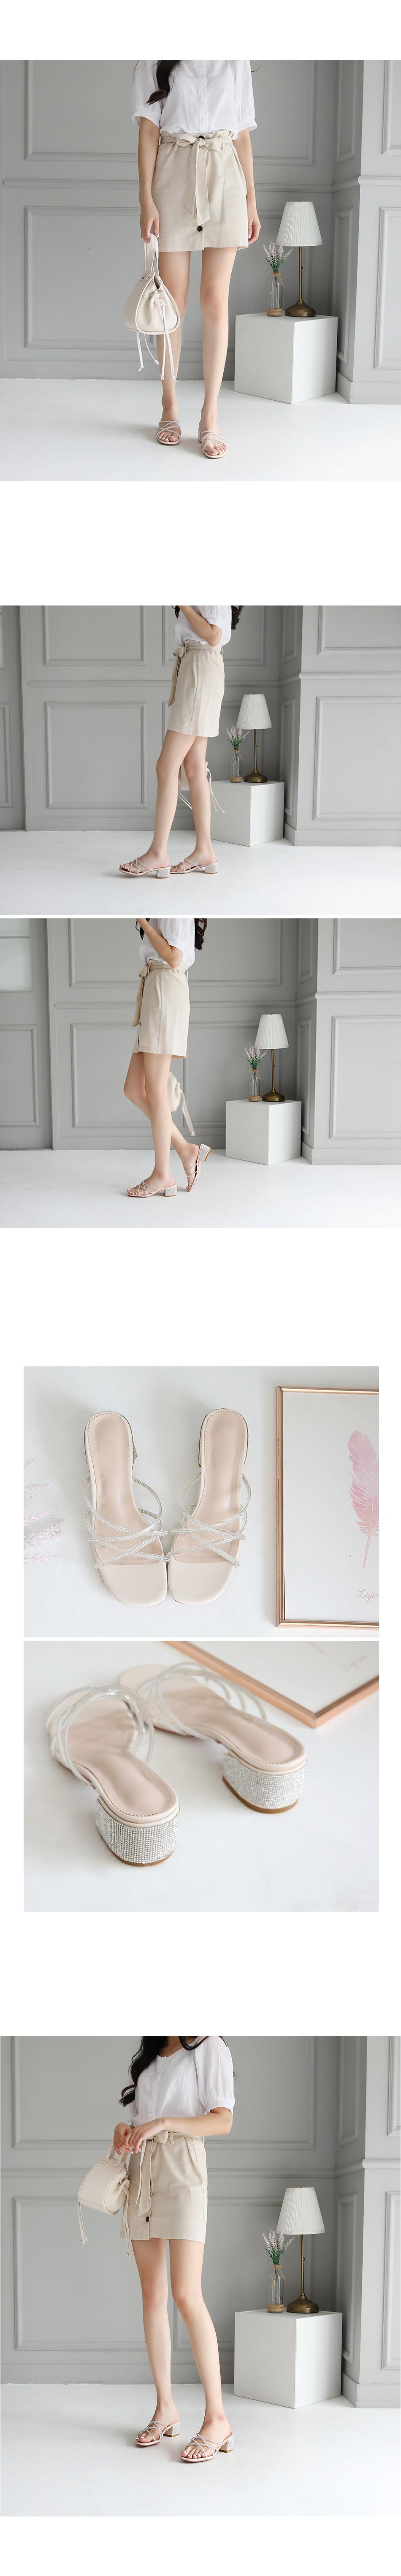 Steel mule slippers 5cm